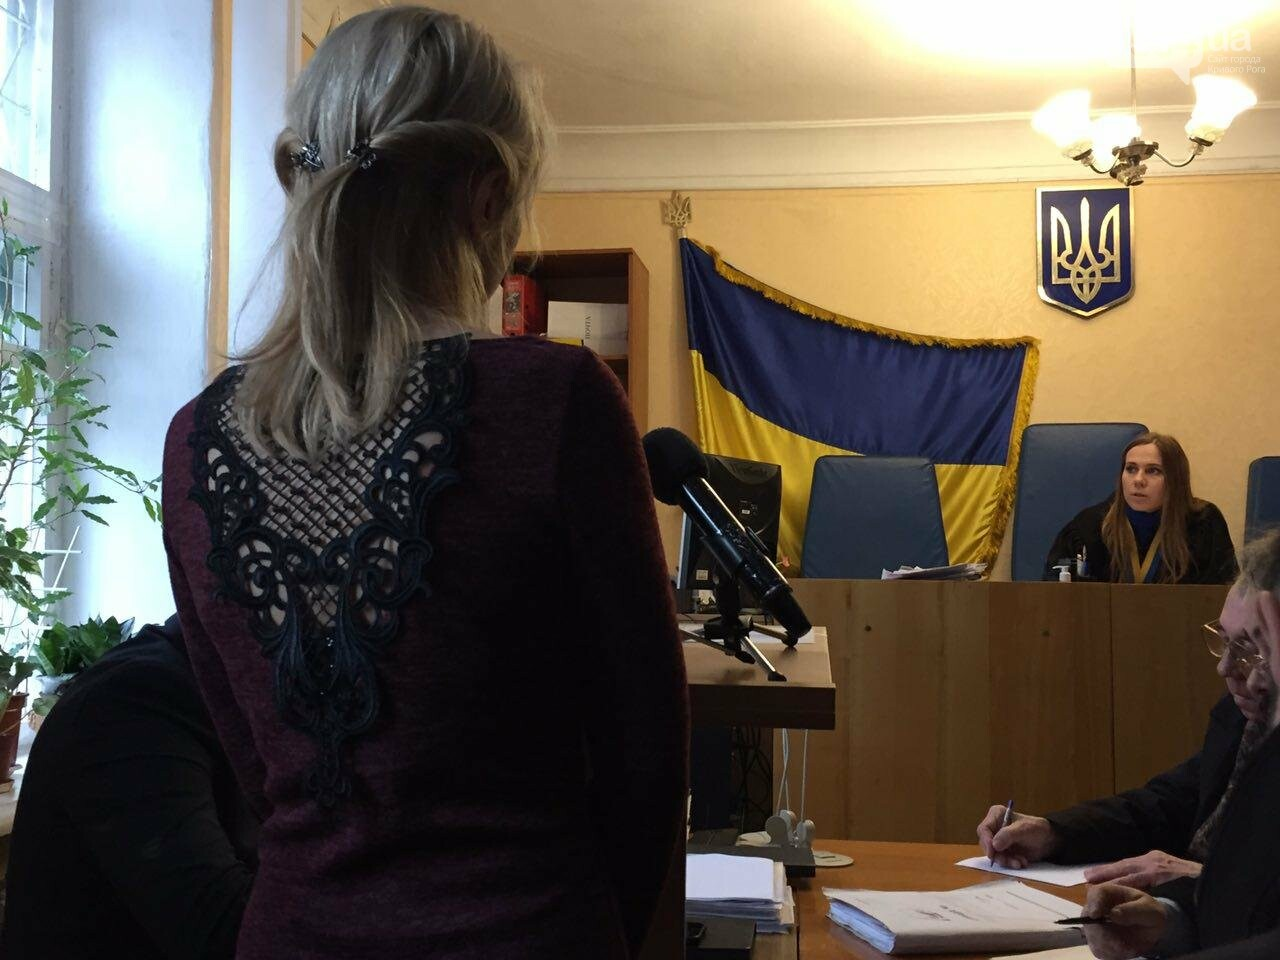 Криворожских журналистов в суде  допрашивают по делу Вячеслава Волка (ФОТО), фото-1